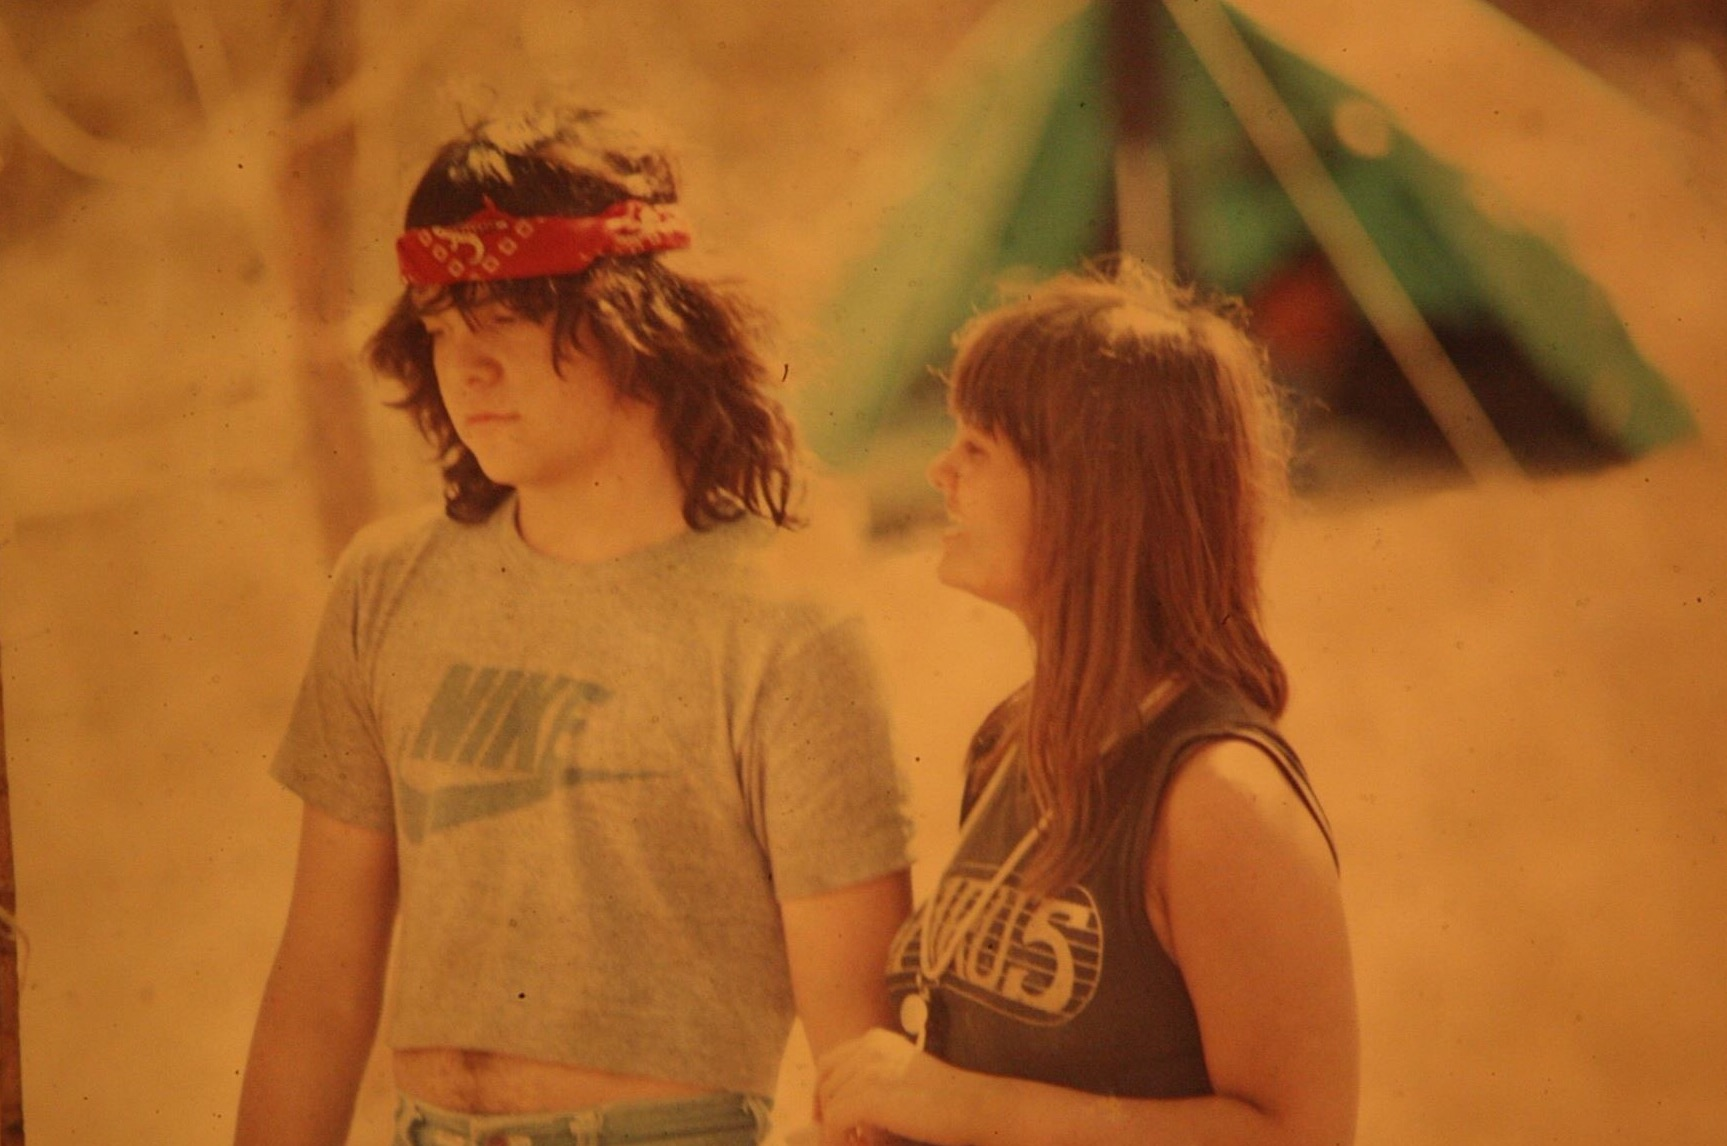 Carlos and Eliana, Summer 1983